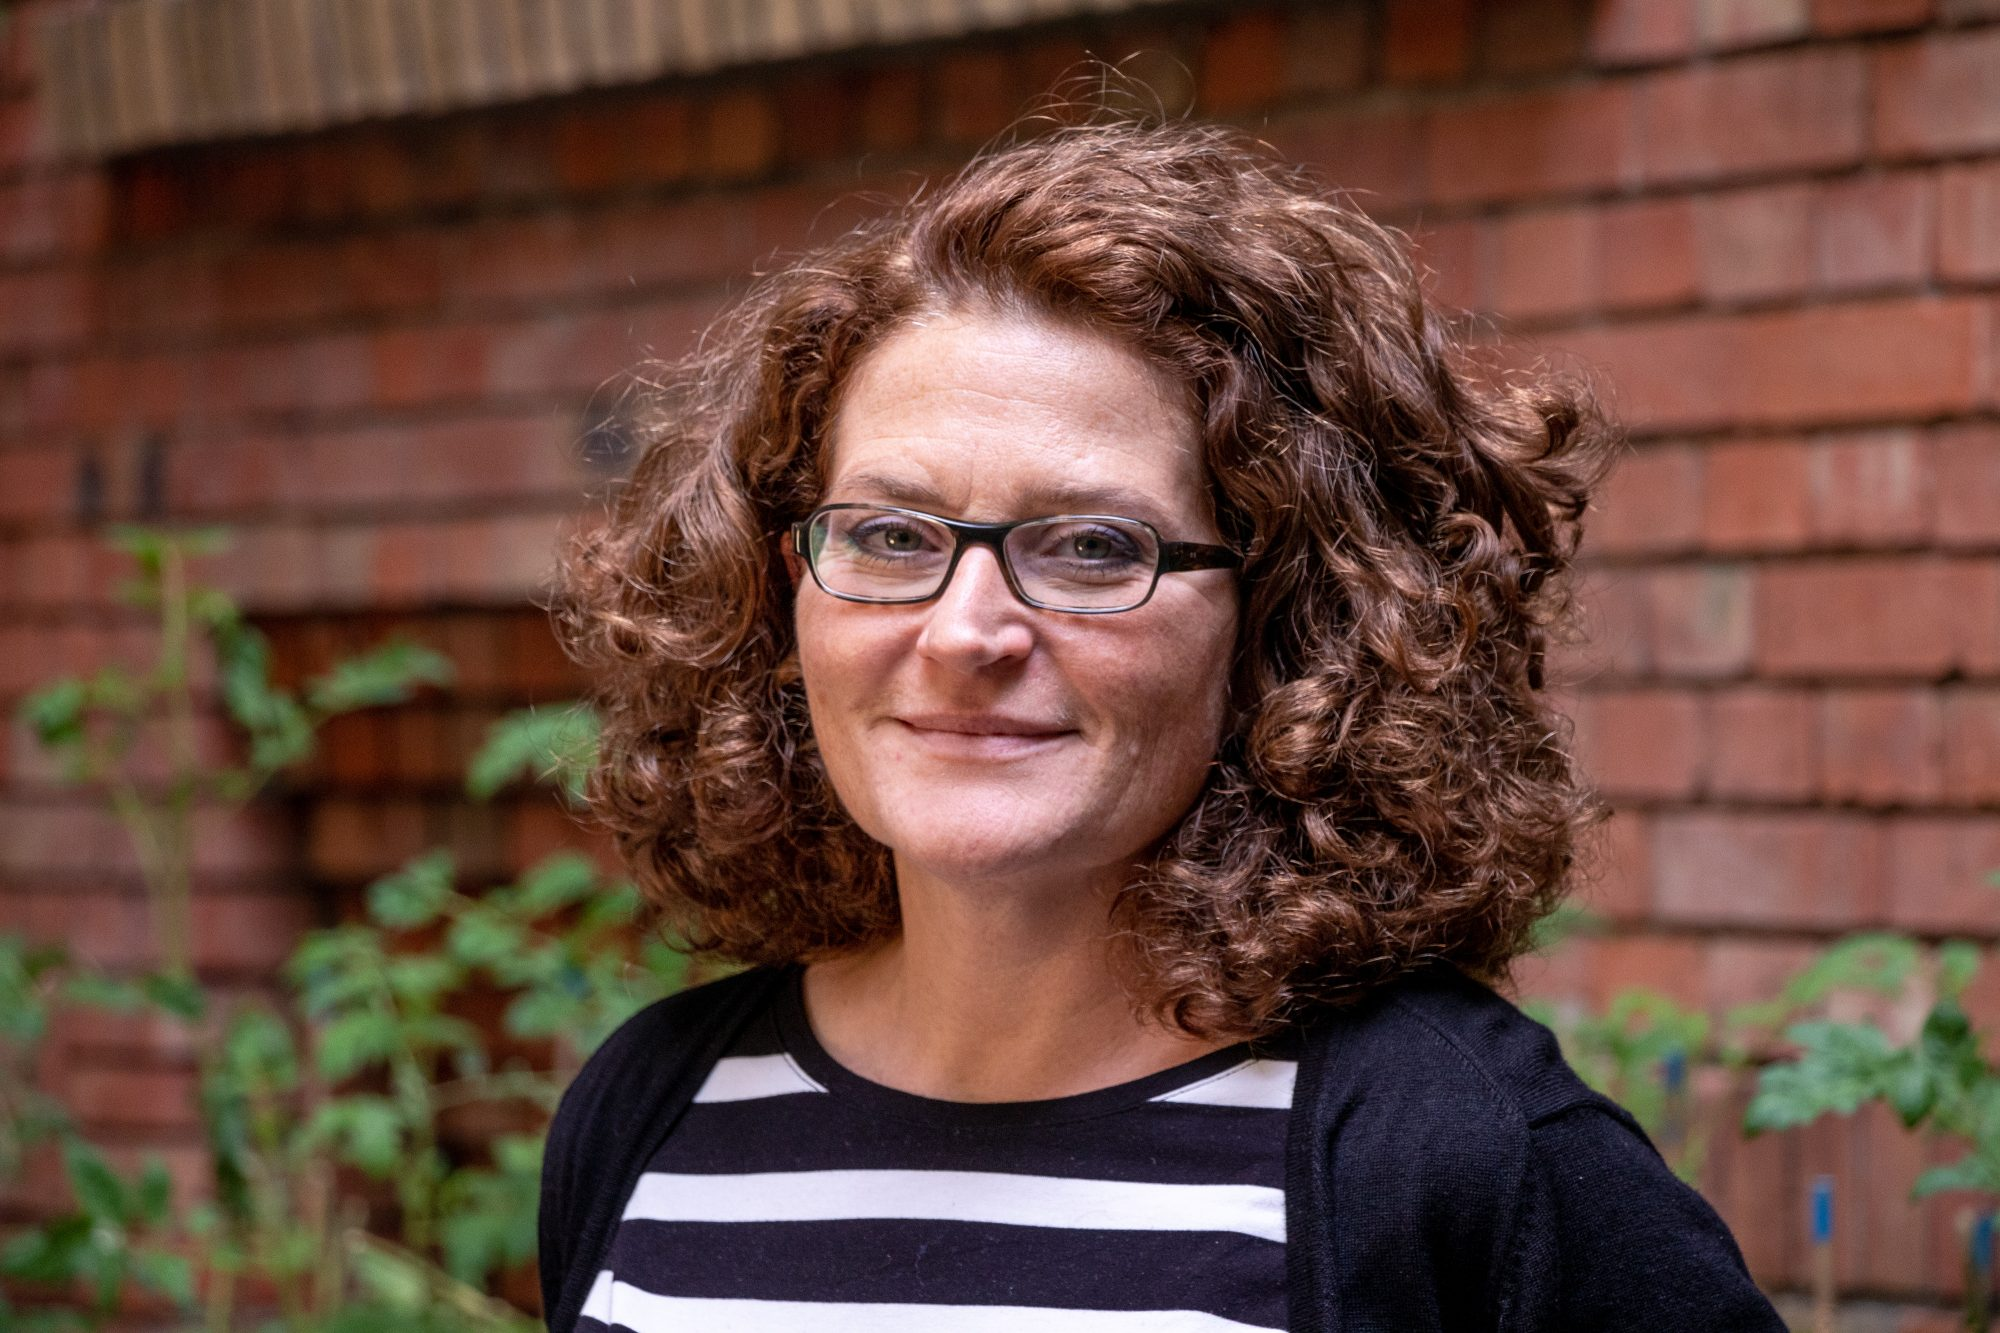 Anita Ripke